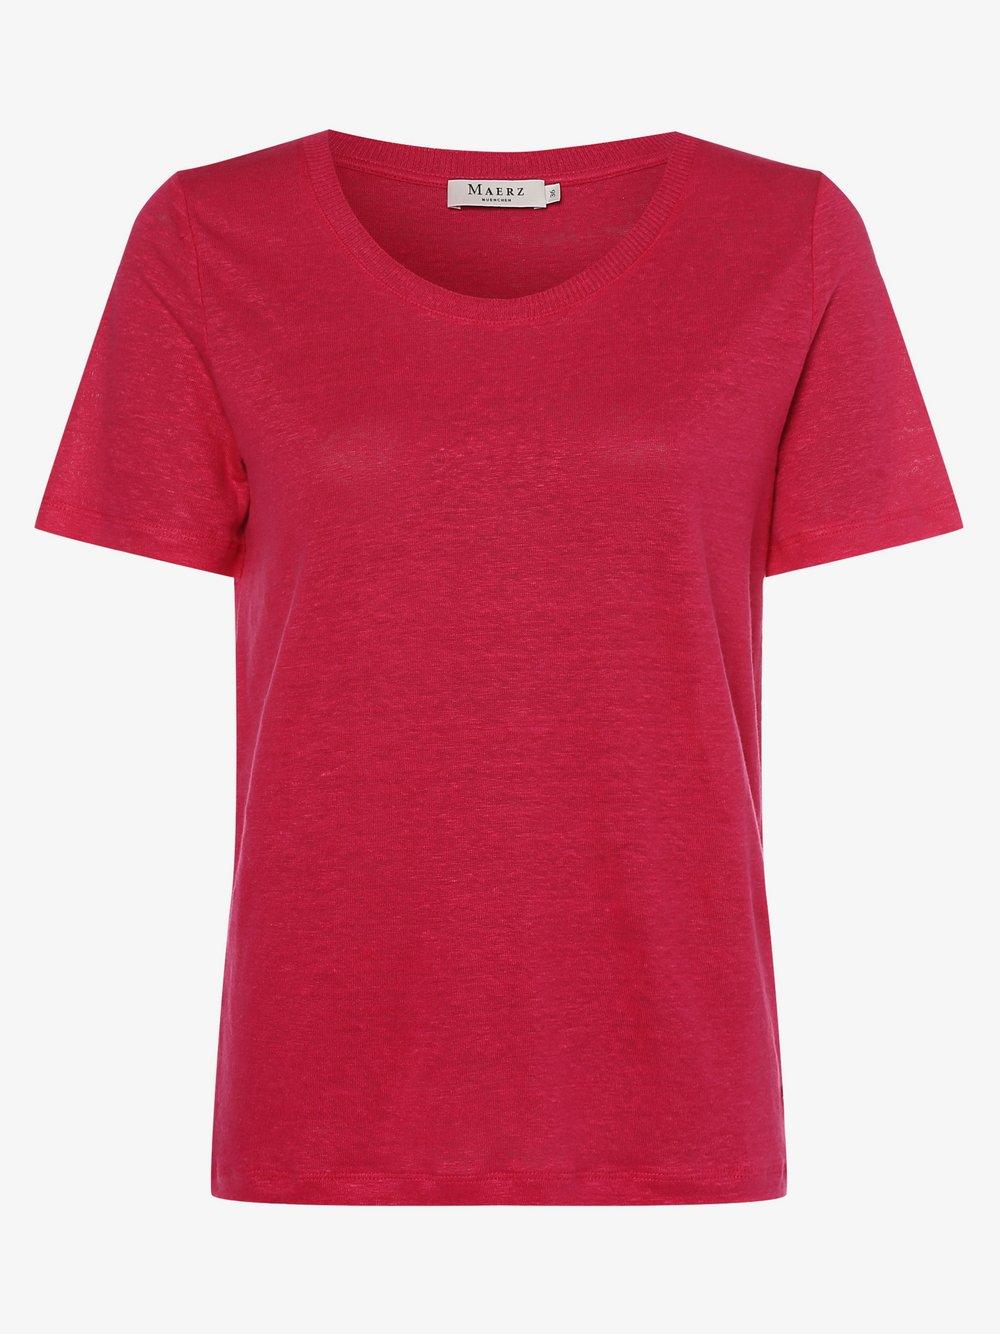 März – Damski T-shirt z lnu, czerwony Van Graaf 466110-0003-00360